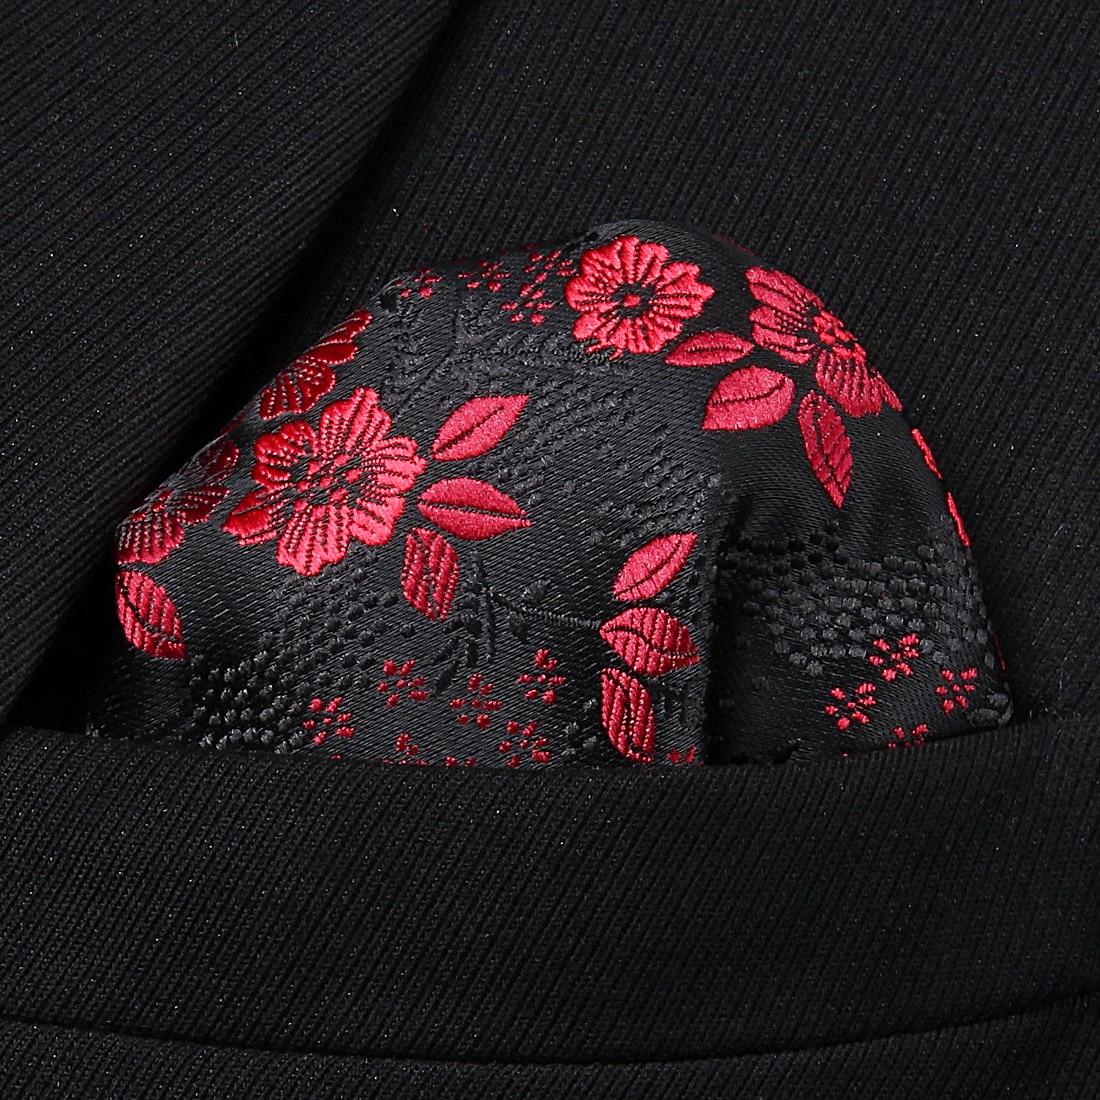 HF3001U Burgundy Black  Floral Men Silk Party Handkerchief Pocket Square Hanky